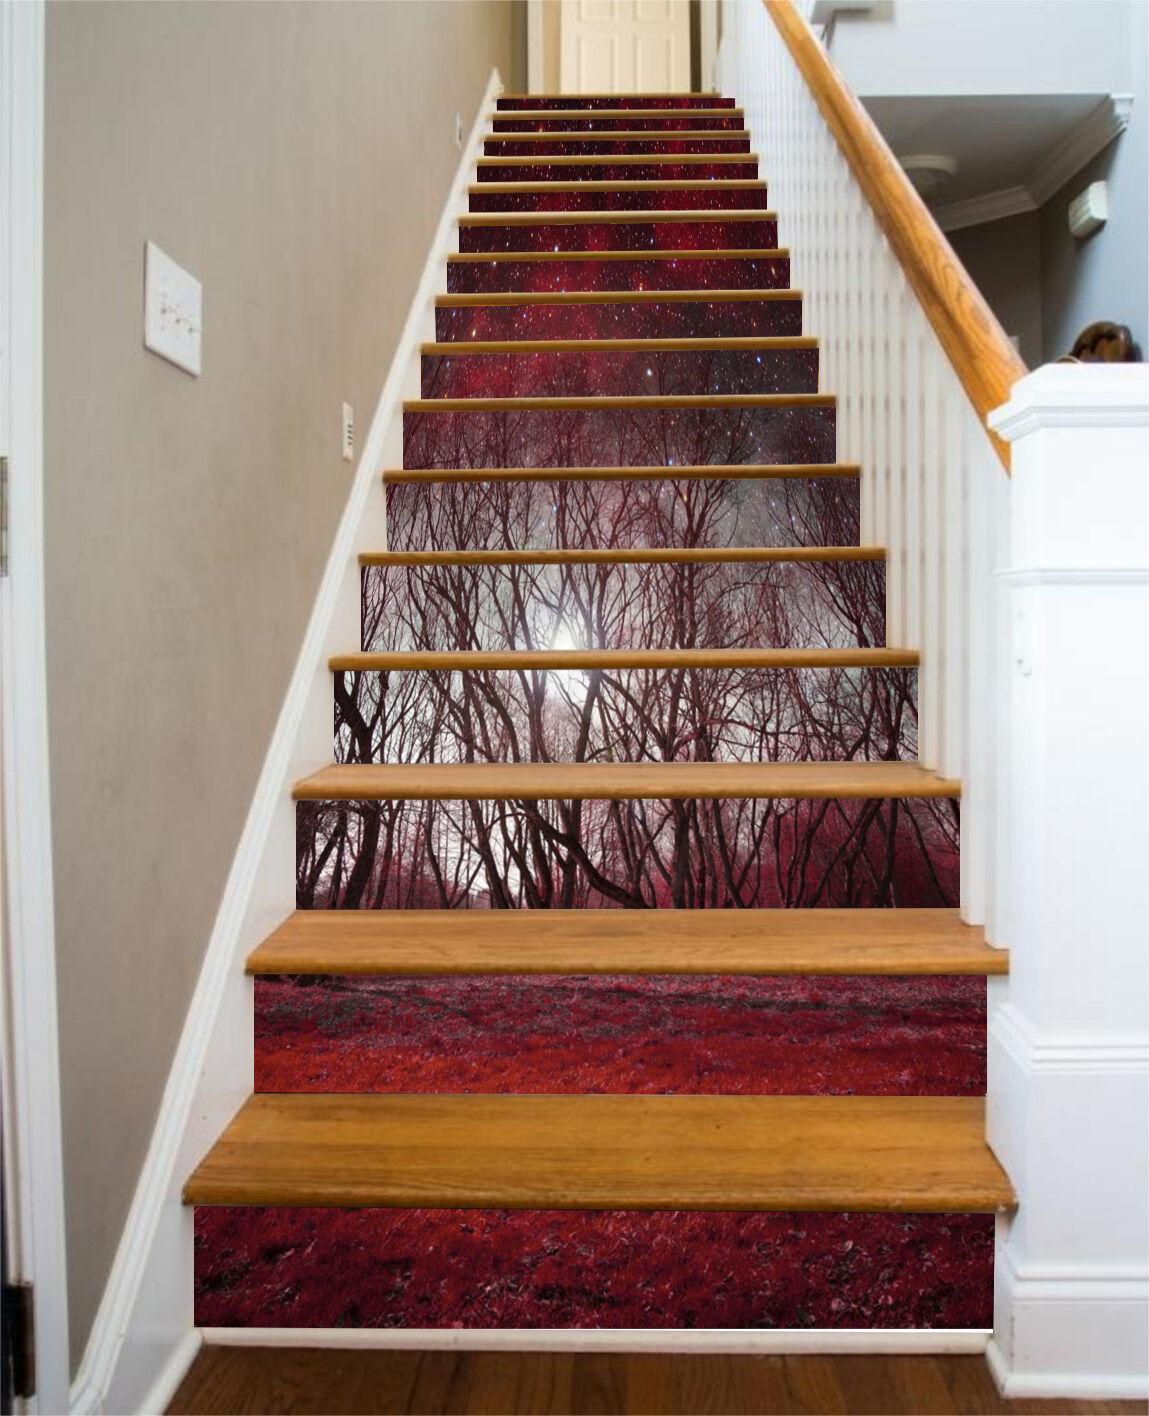 3D rot woods 7 Stair Risers Decoration Photo Mural Vinyl Decal Wallpaper UK